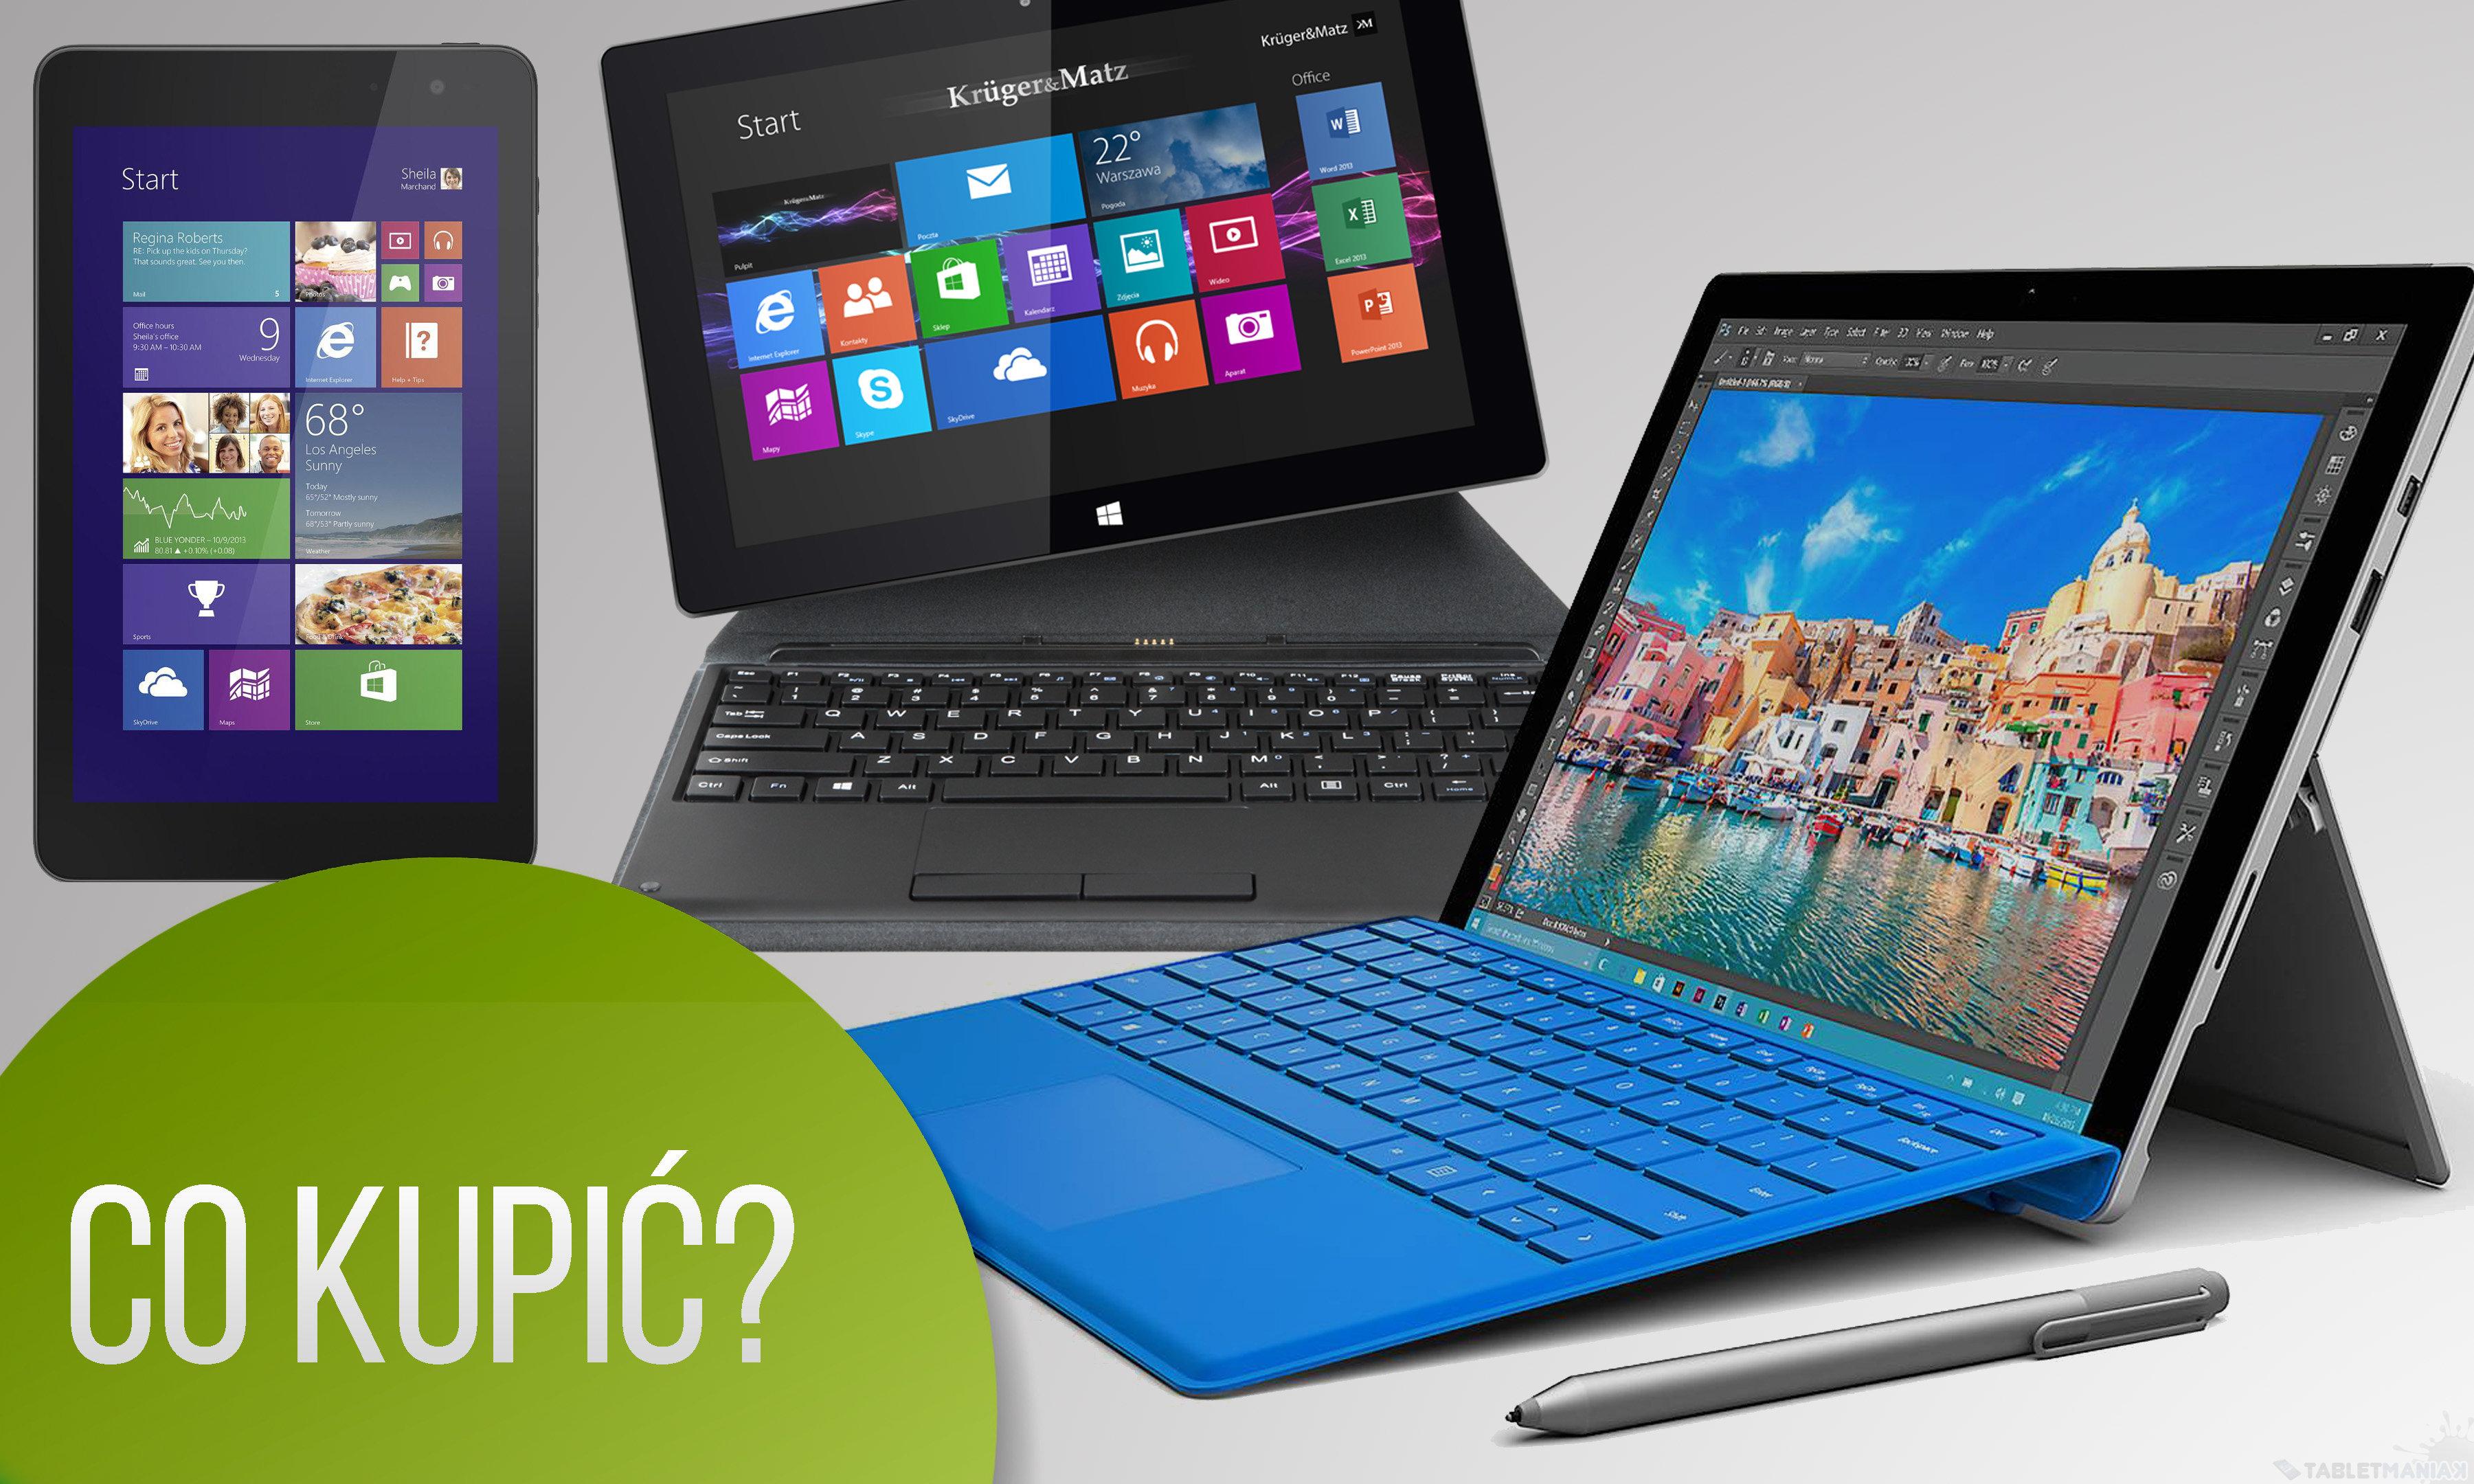 Jaki tablet z Windows 10 kupić?